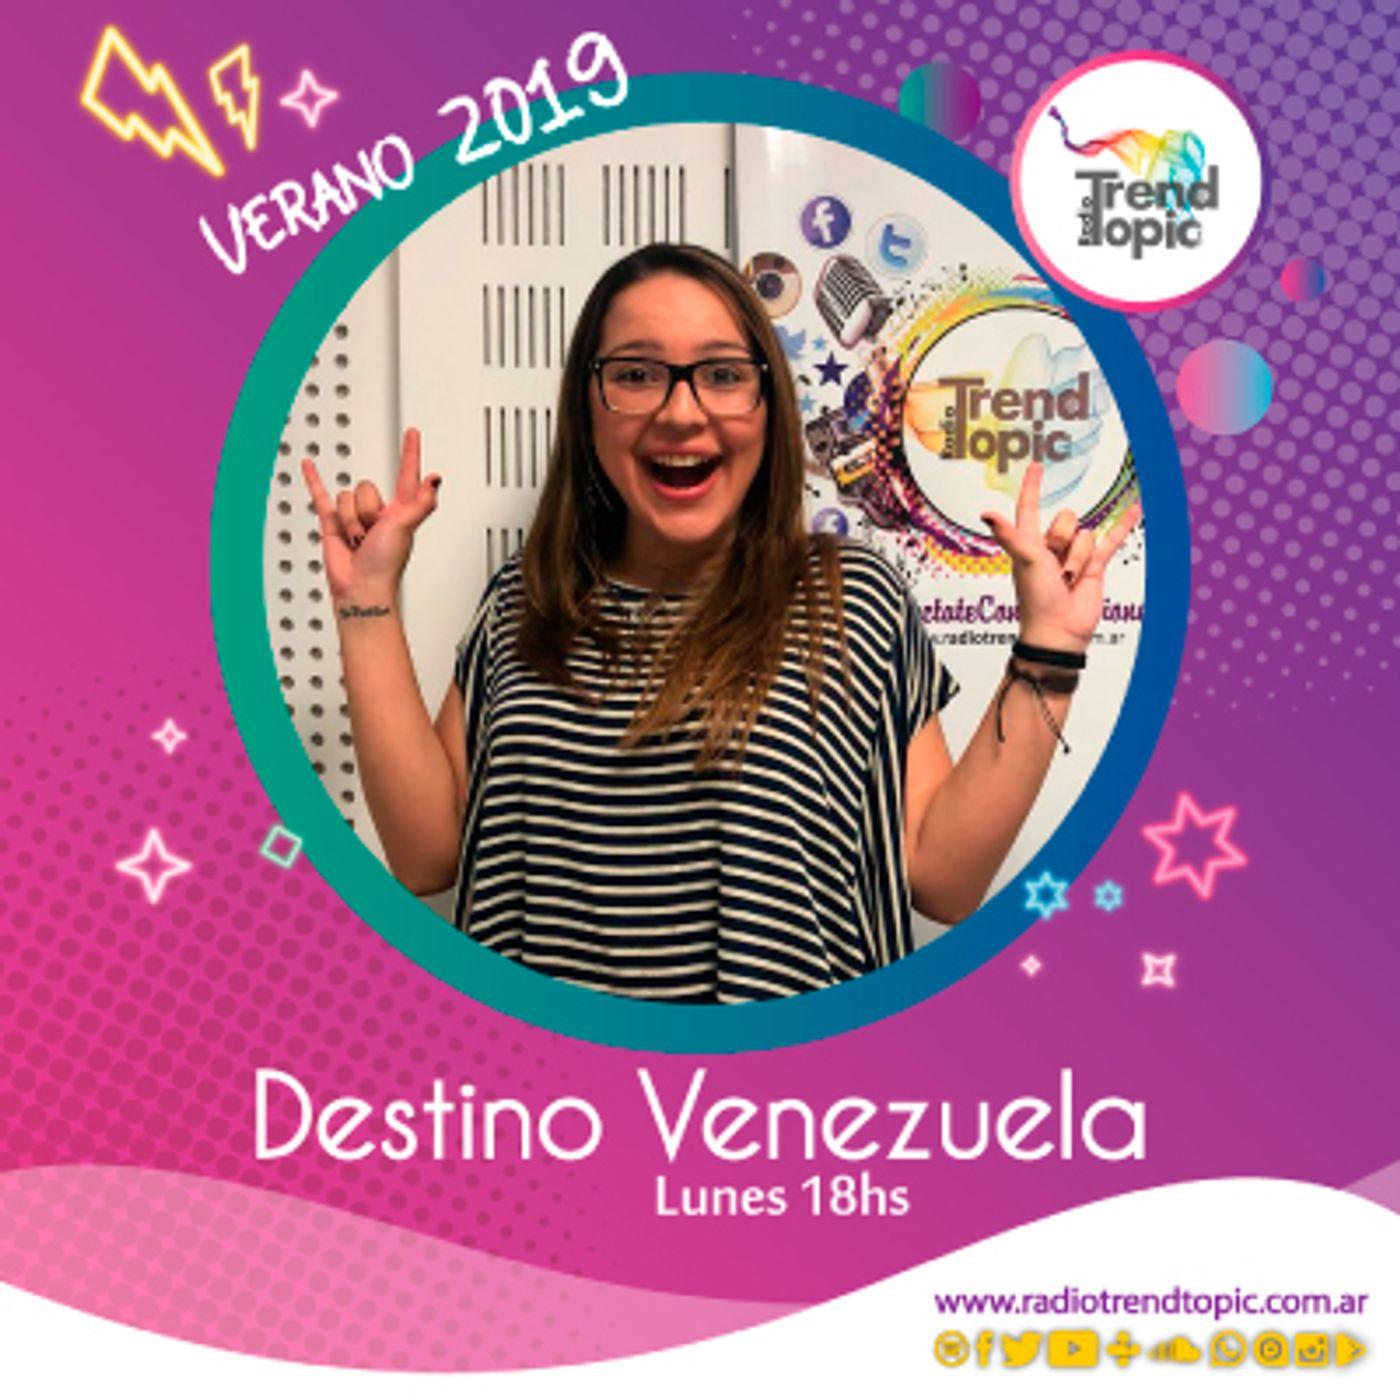 Destino Venezuela T1 P13 - Valavys - Parranda navideña - San Juan Music